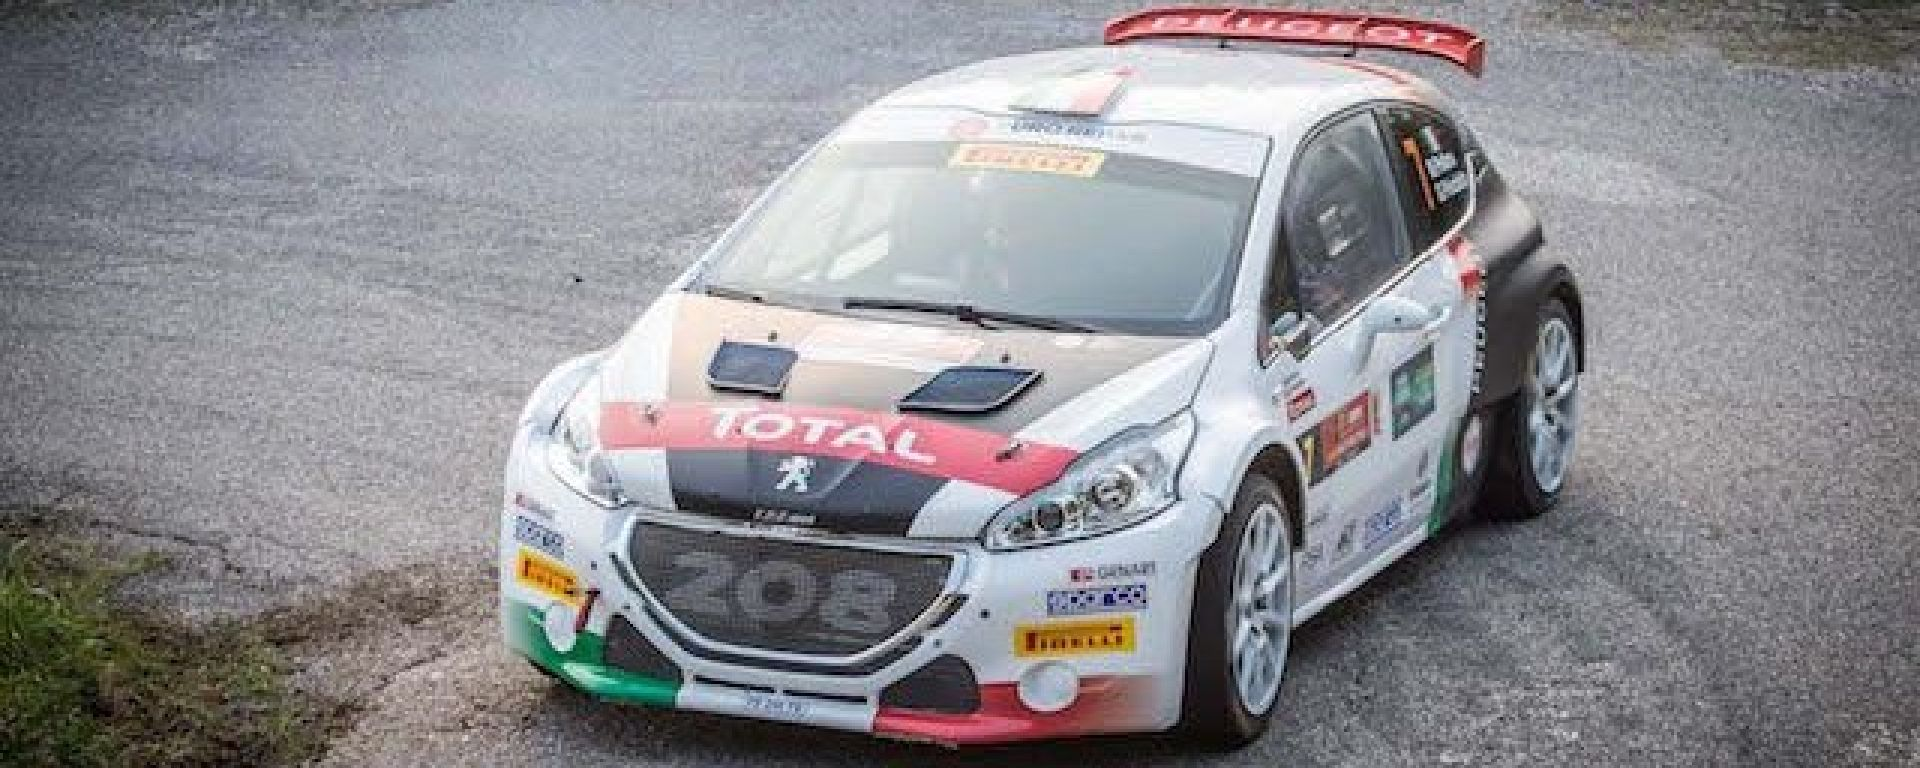 46° Rally San Marino 2018 - info e risultati